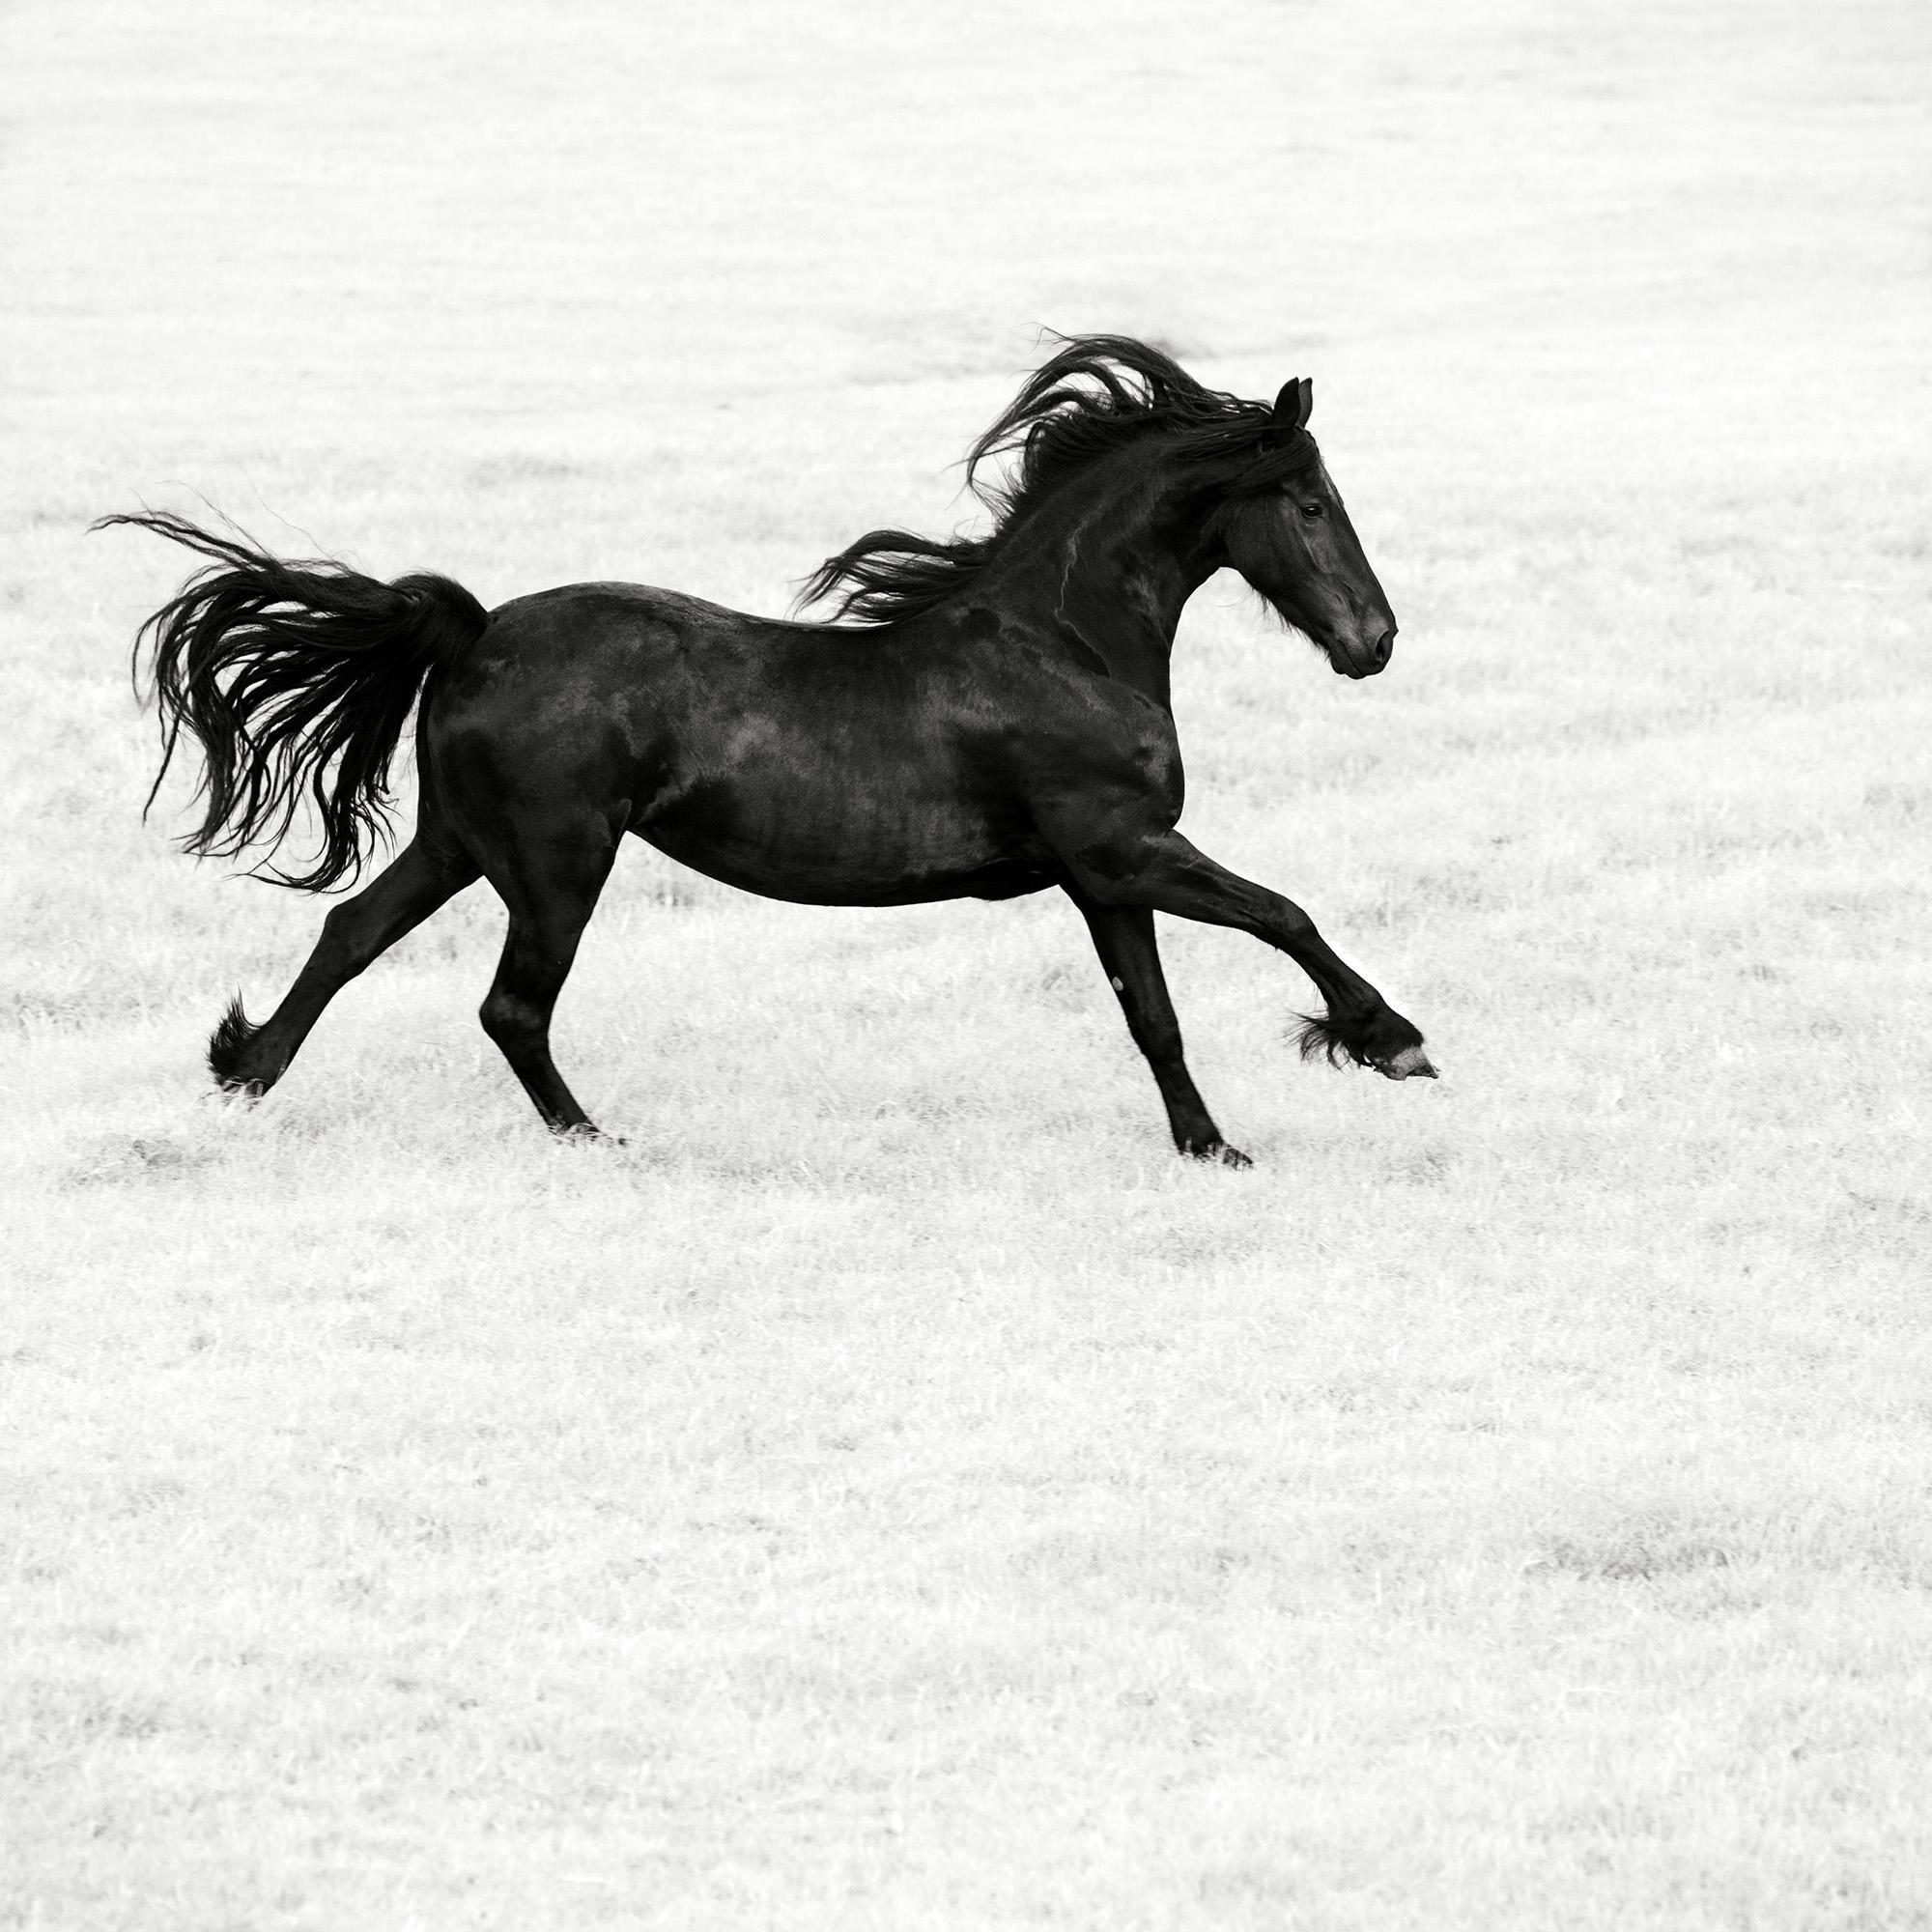 friesian horses animals netherlands - photo #29